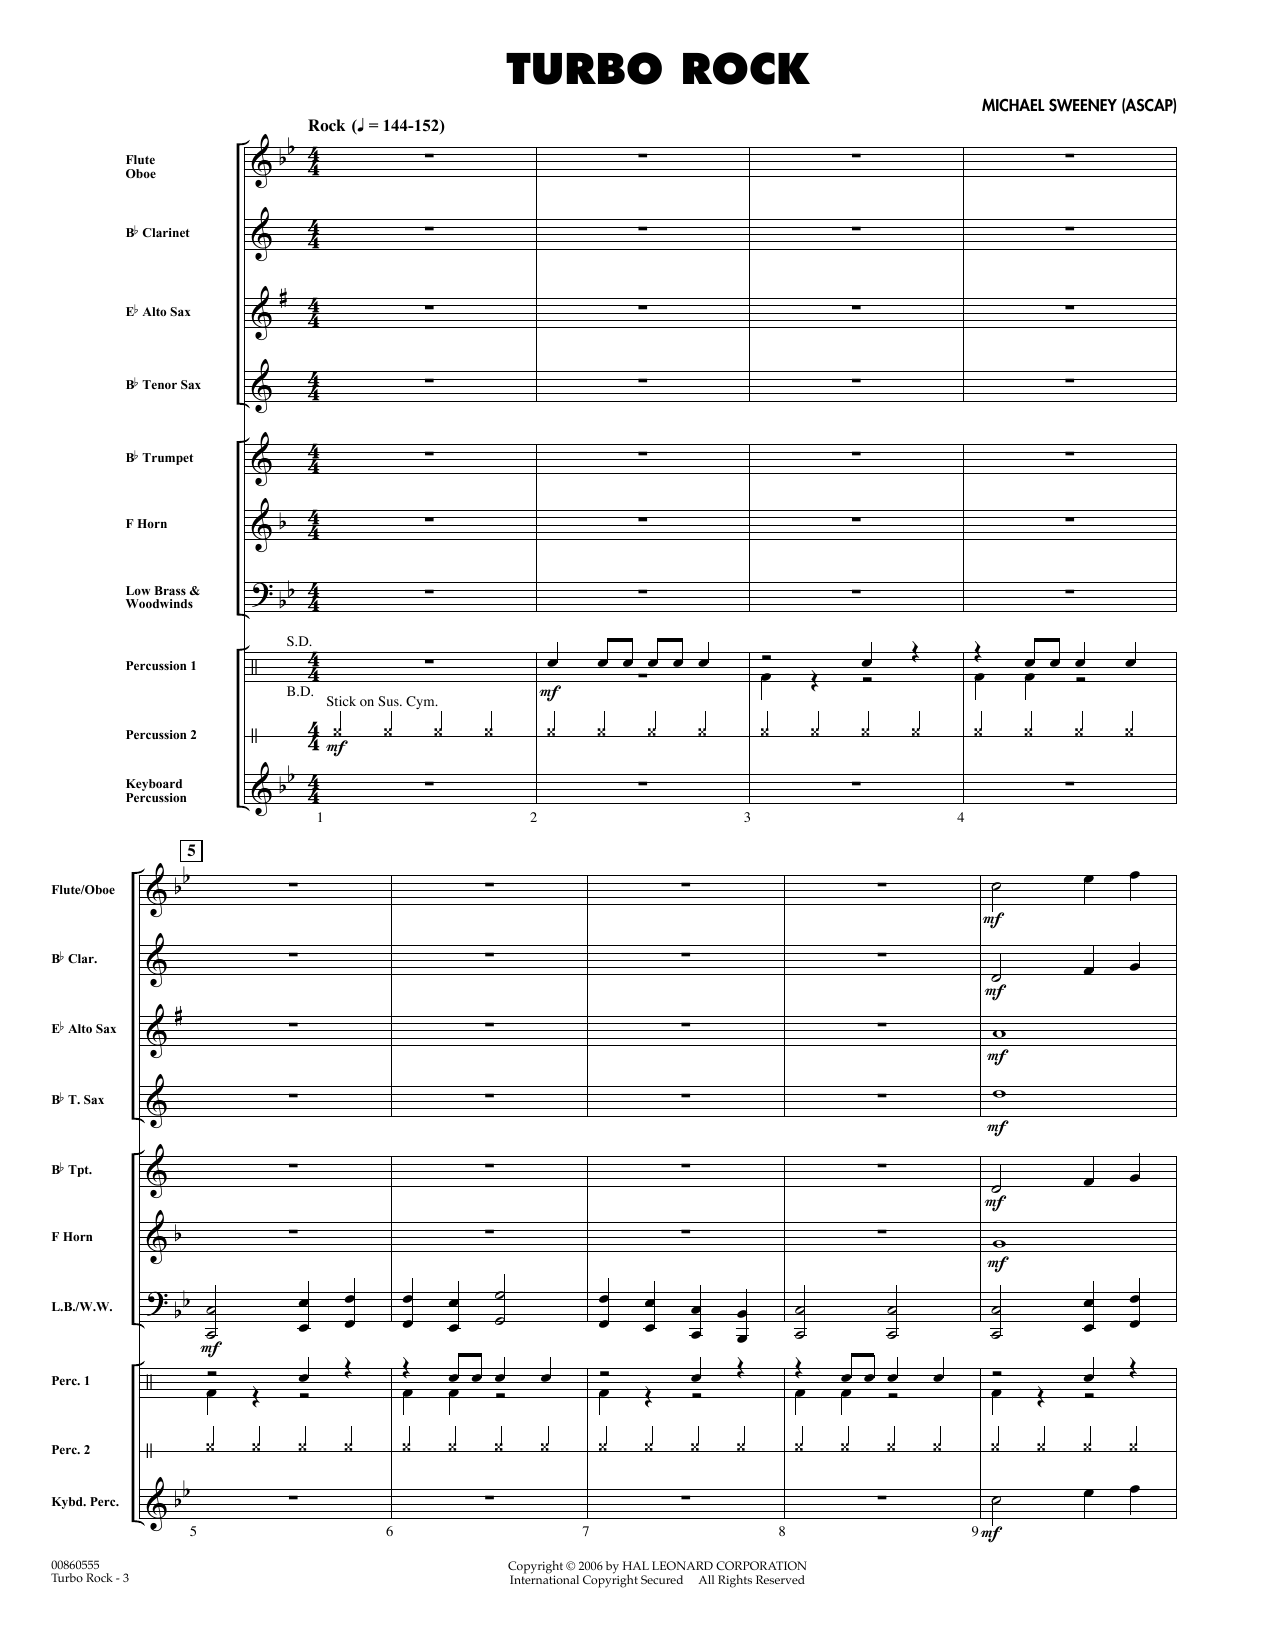 Turbo Rock - Full Score sheet music